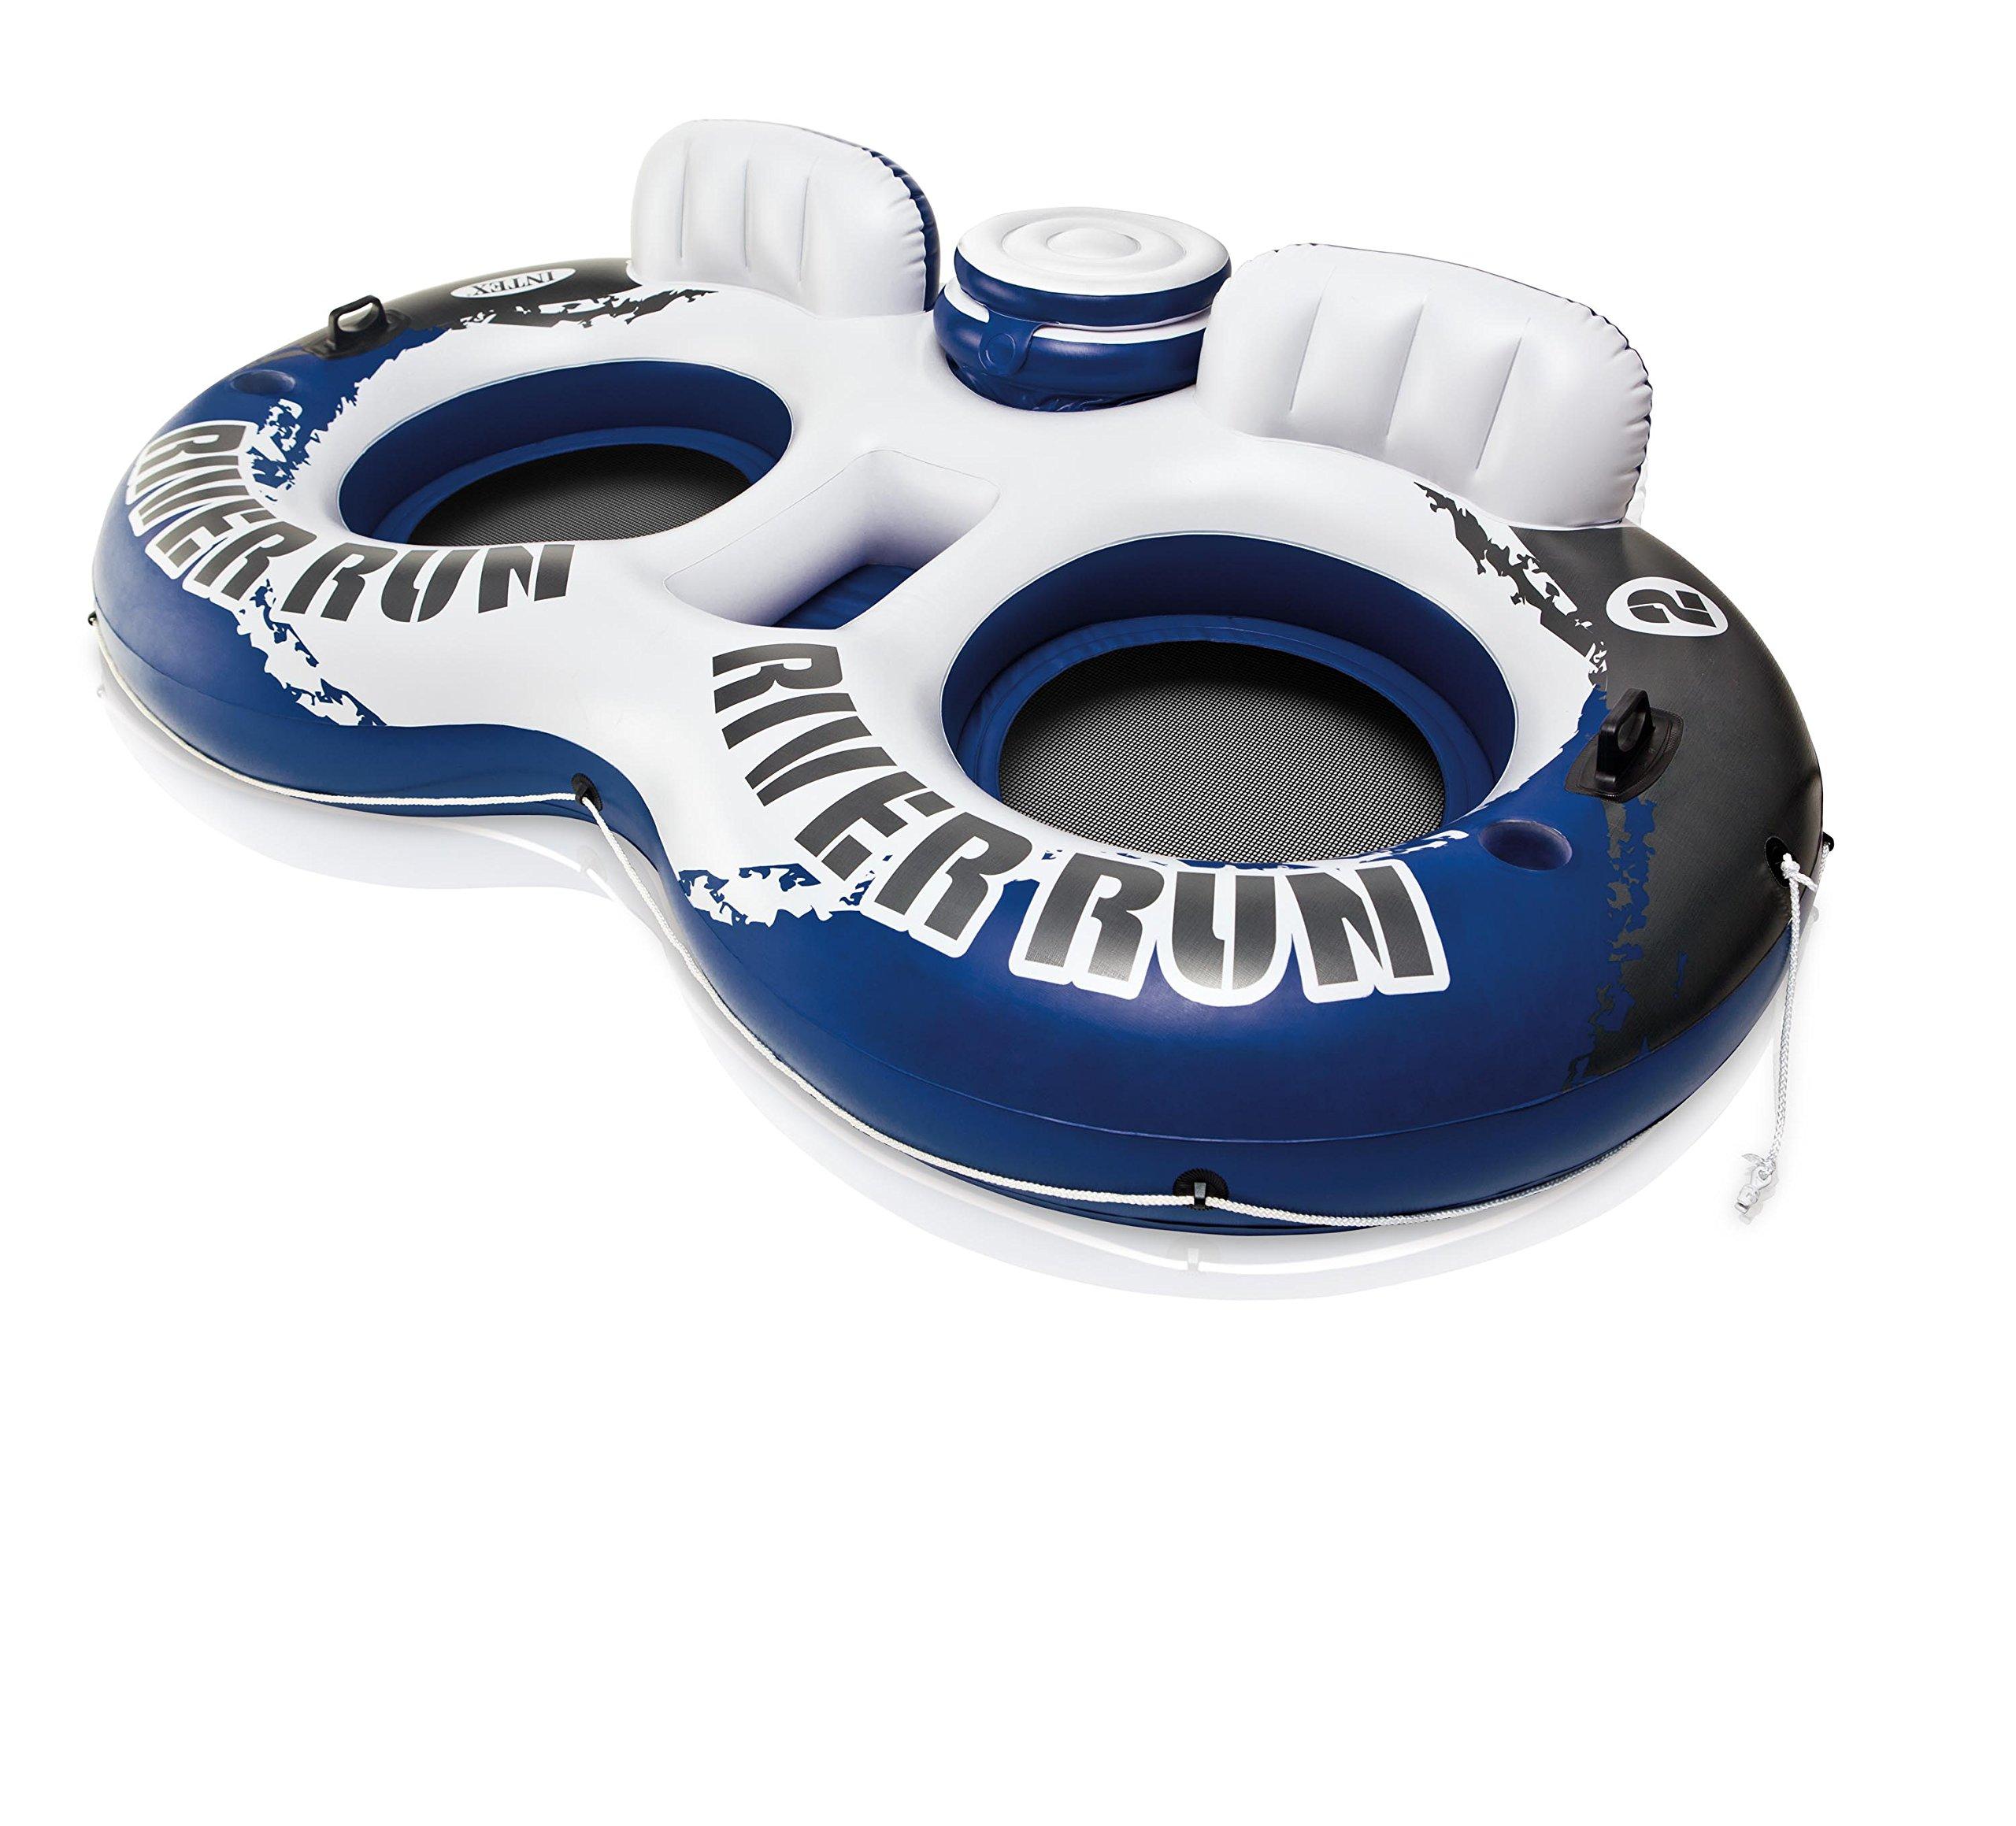 Intex River Run Inflatable Lounger (4 Pack) & Pool Lake Tube Float (2 Pack) by Intex (Image #10)